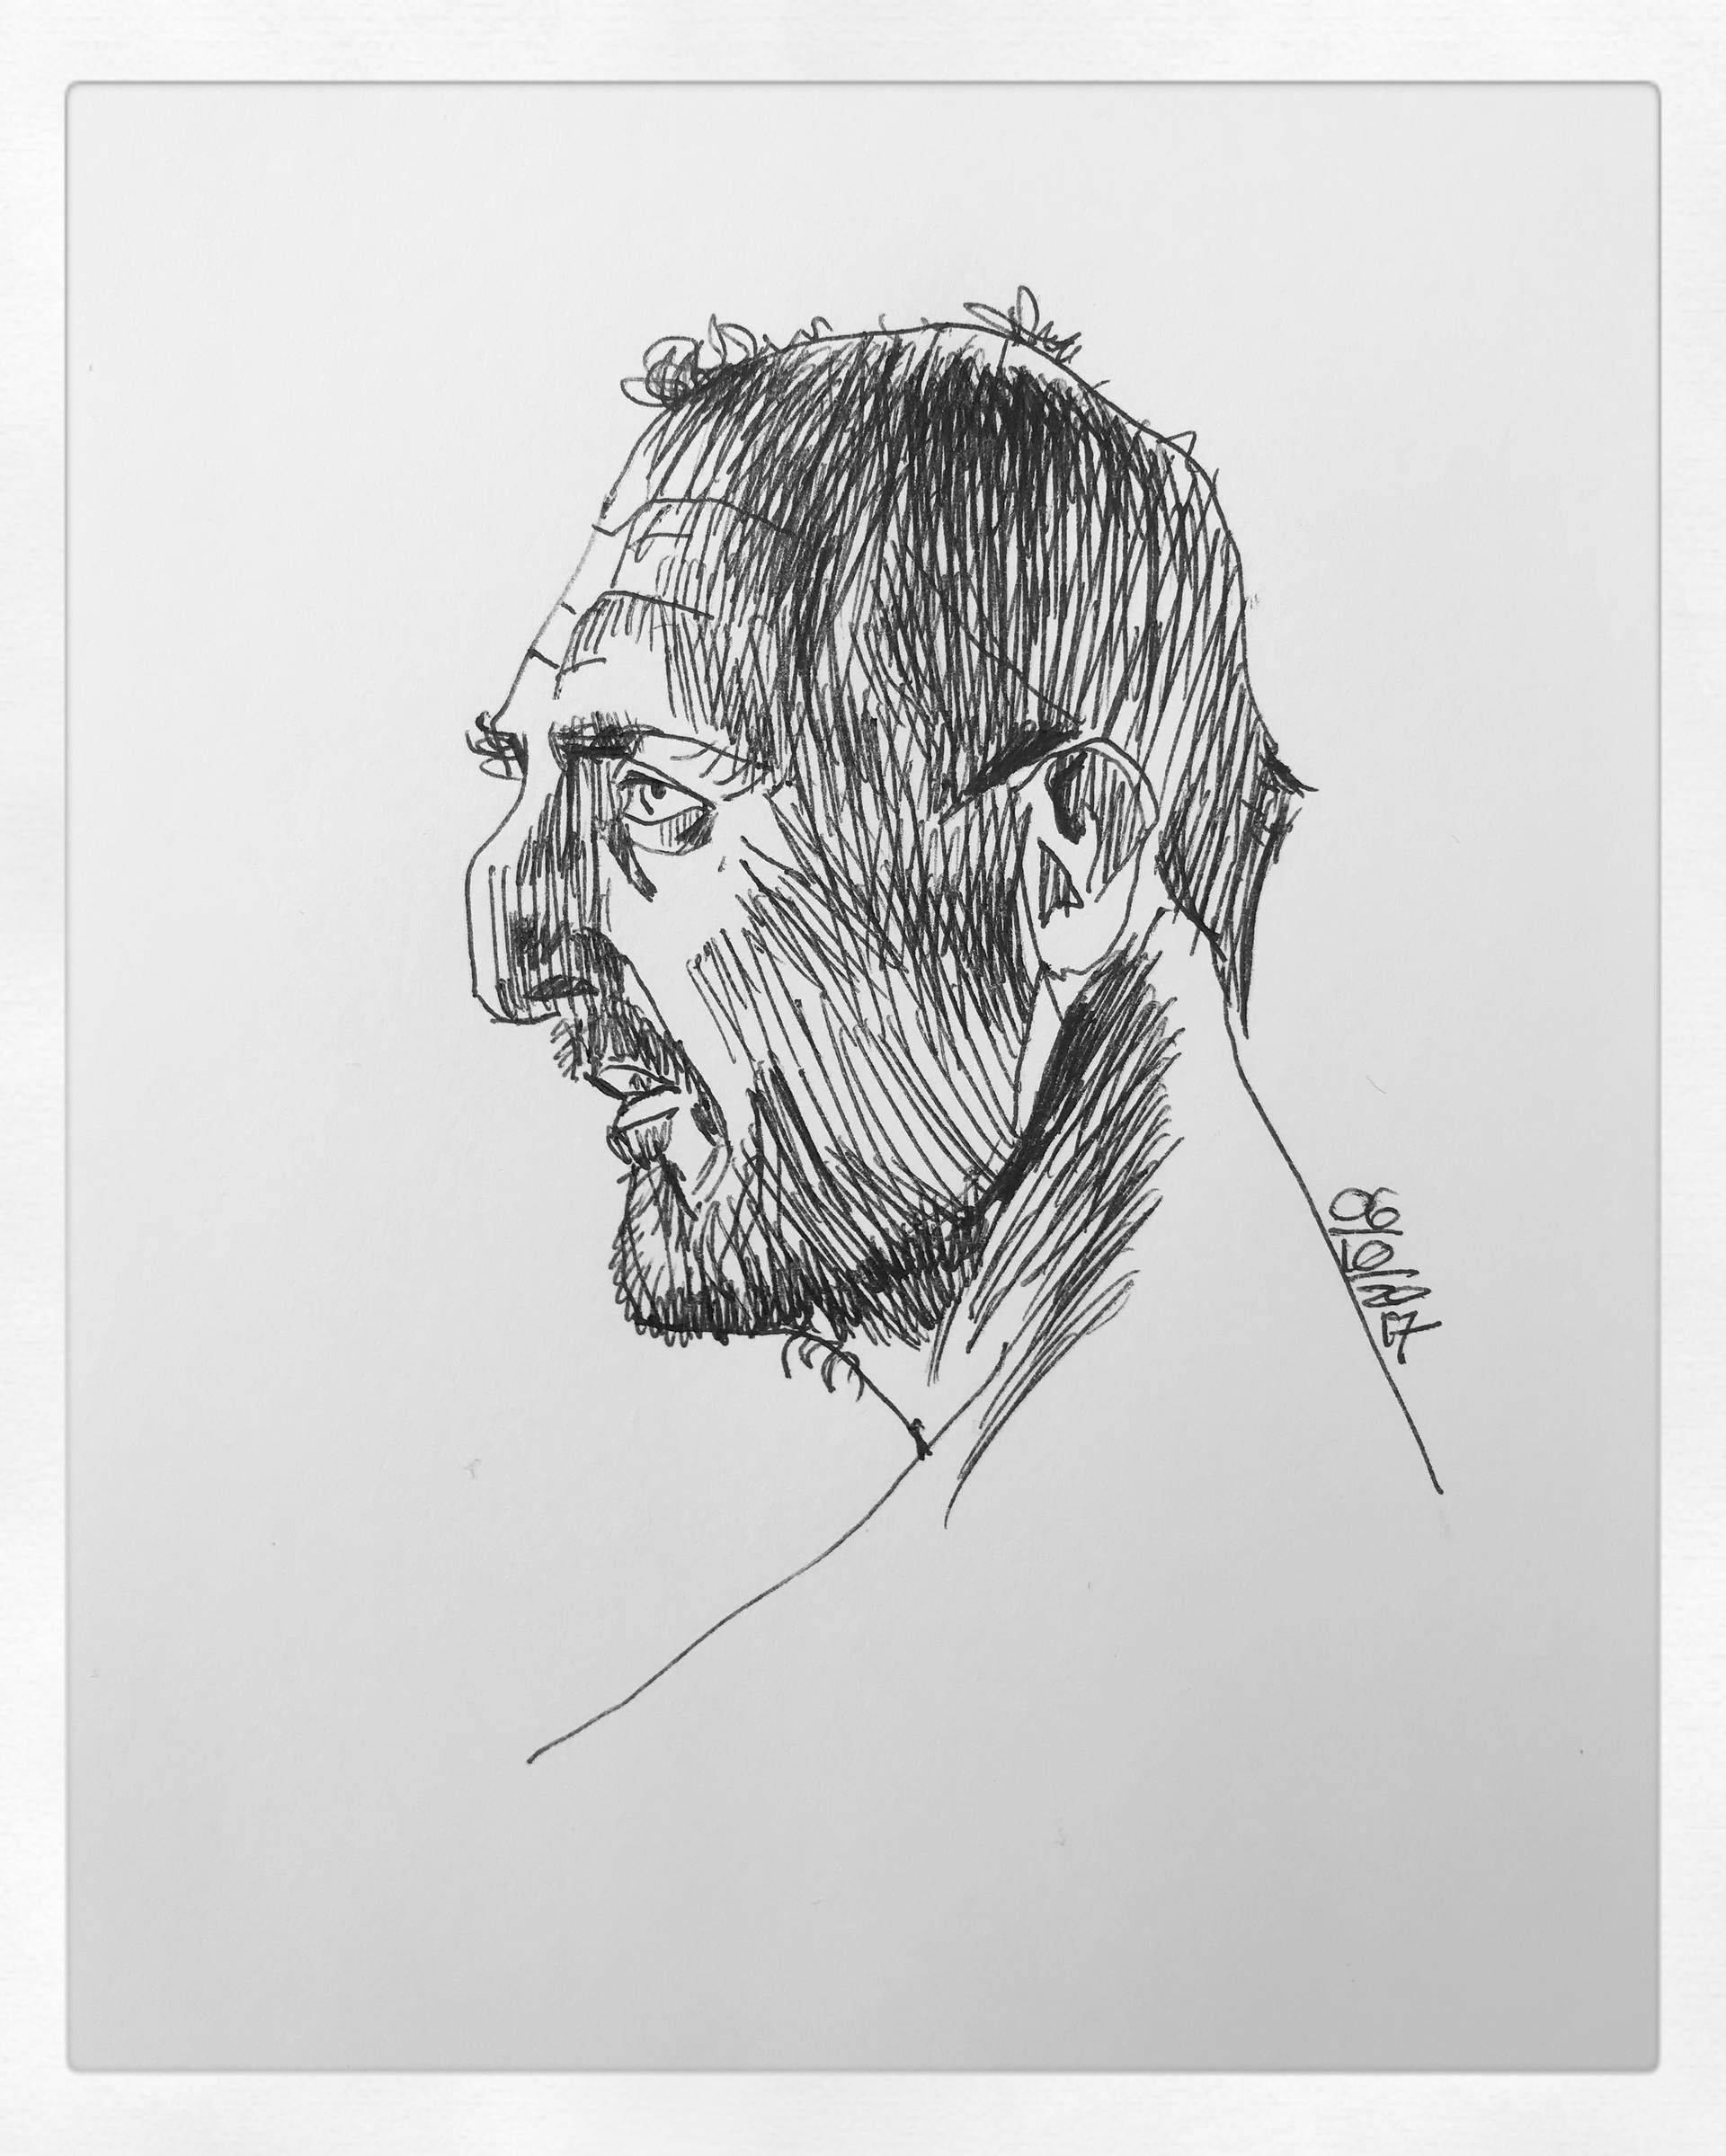 Andrei riabovitchev img 0371